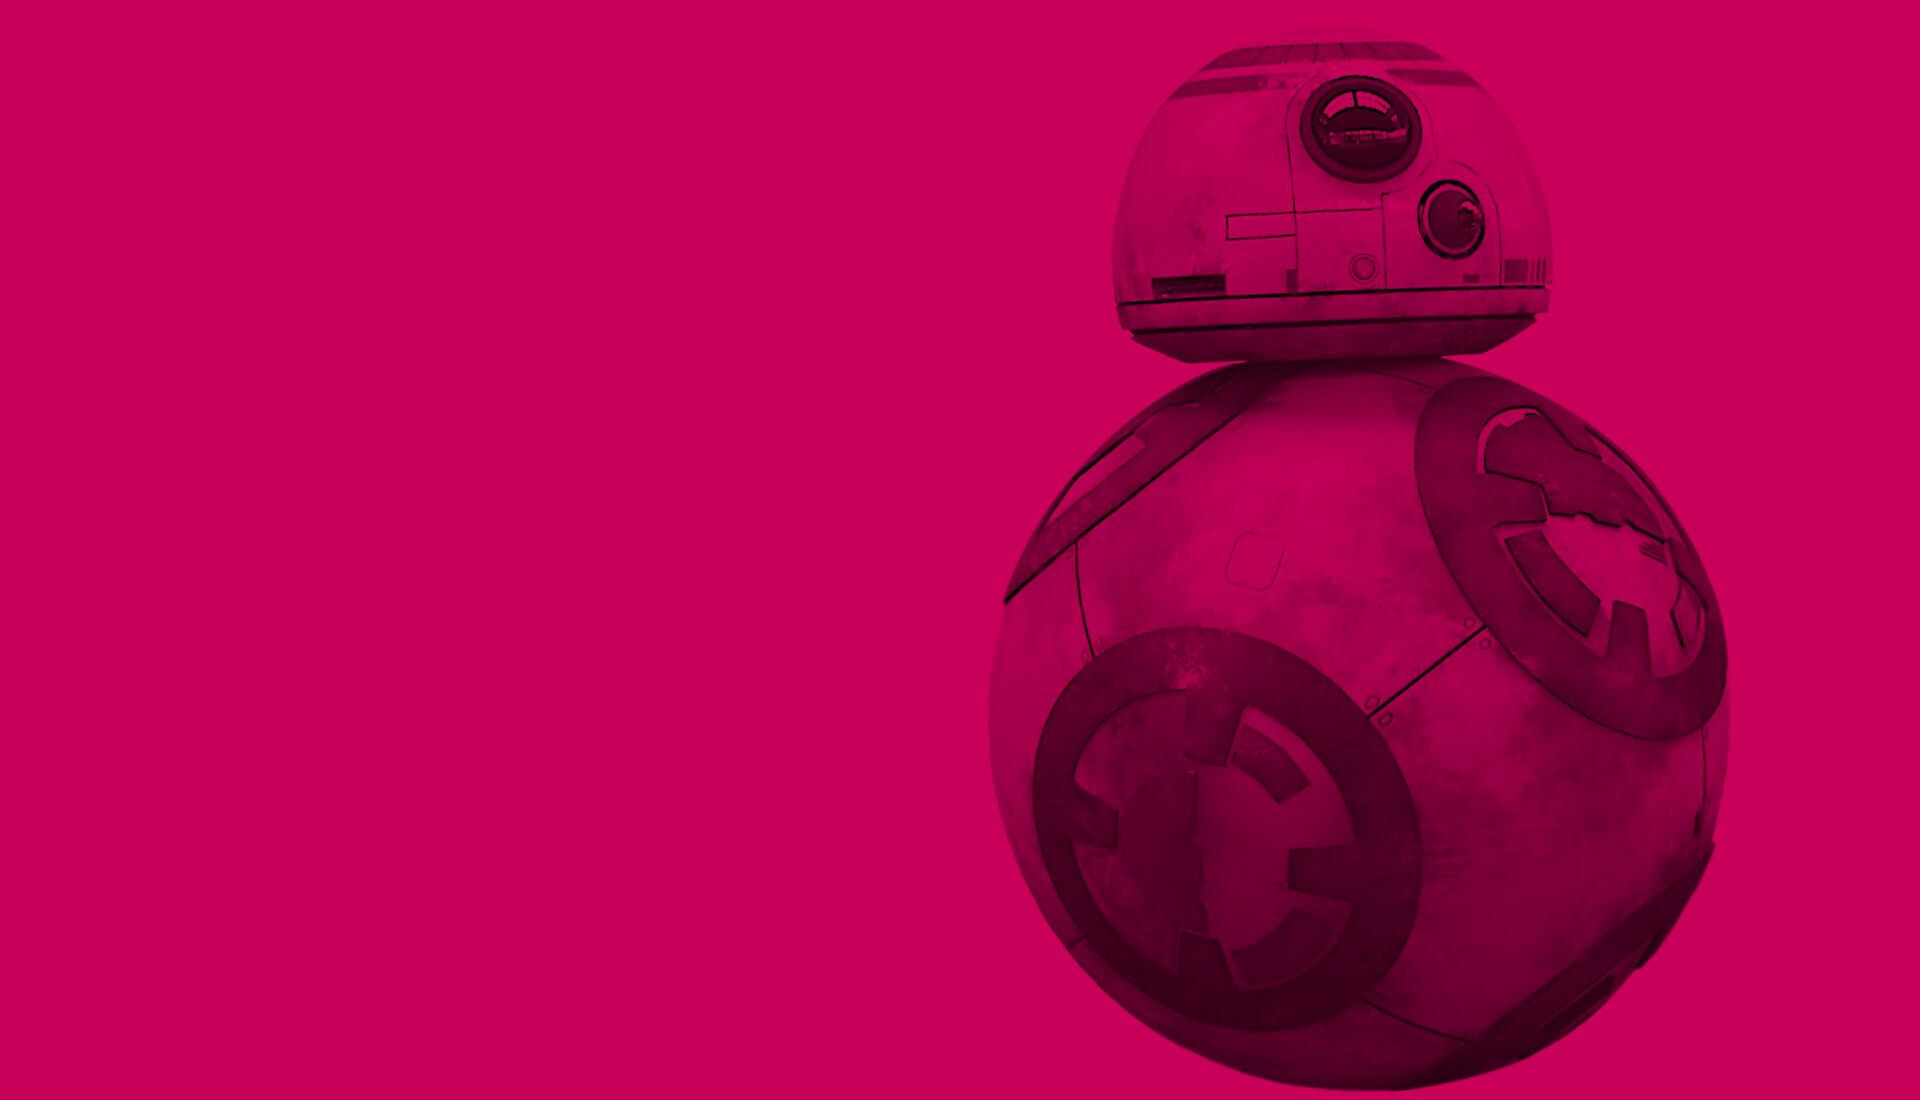 BB8, Star Wars, El despertar de la fuerza